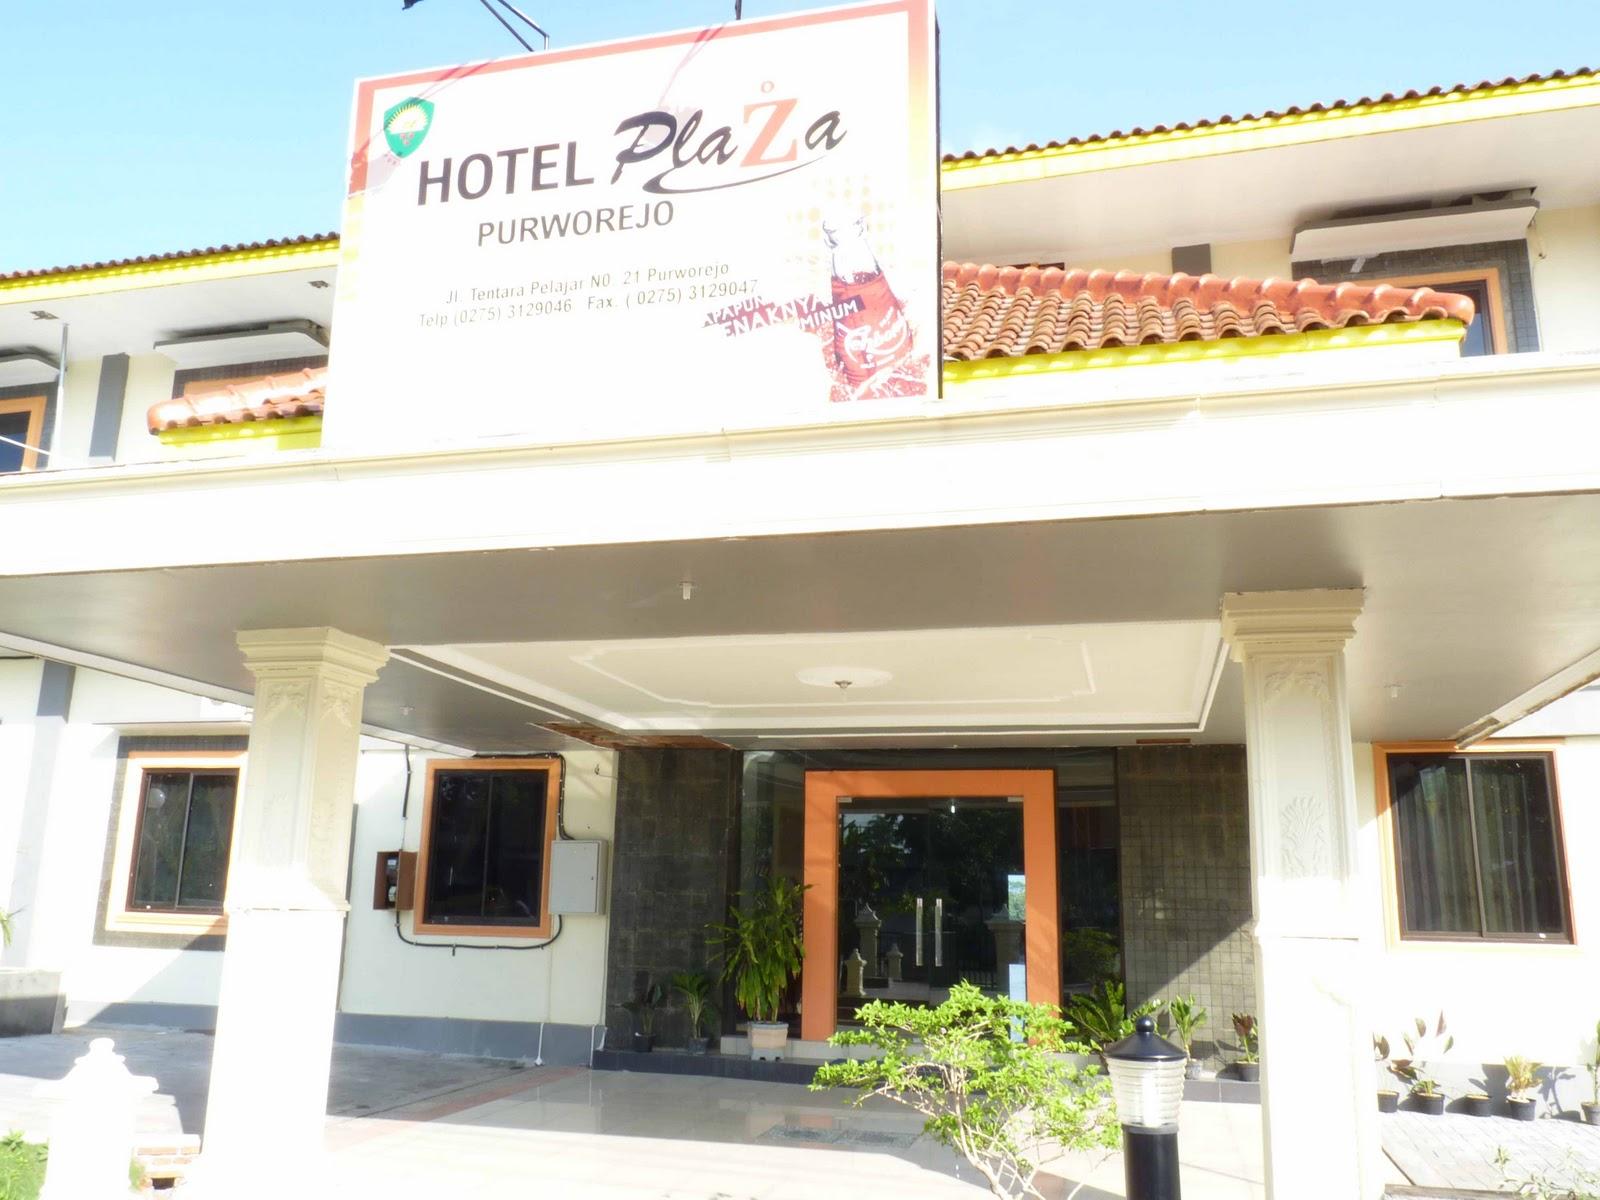 hotel plaza purworejo purworejo rh wikimapia org  daftar hotel di purworejo dan tarifnya